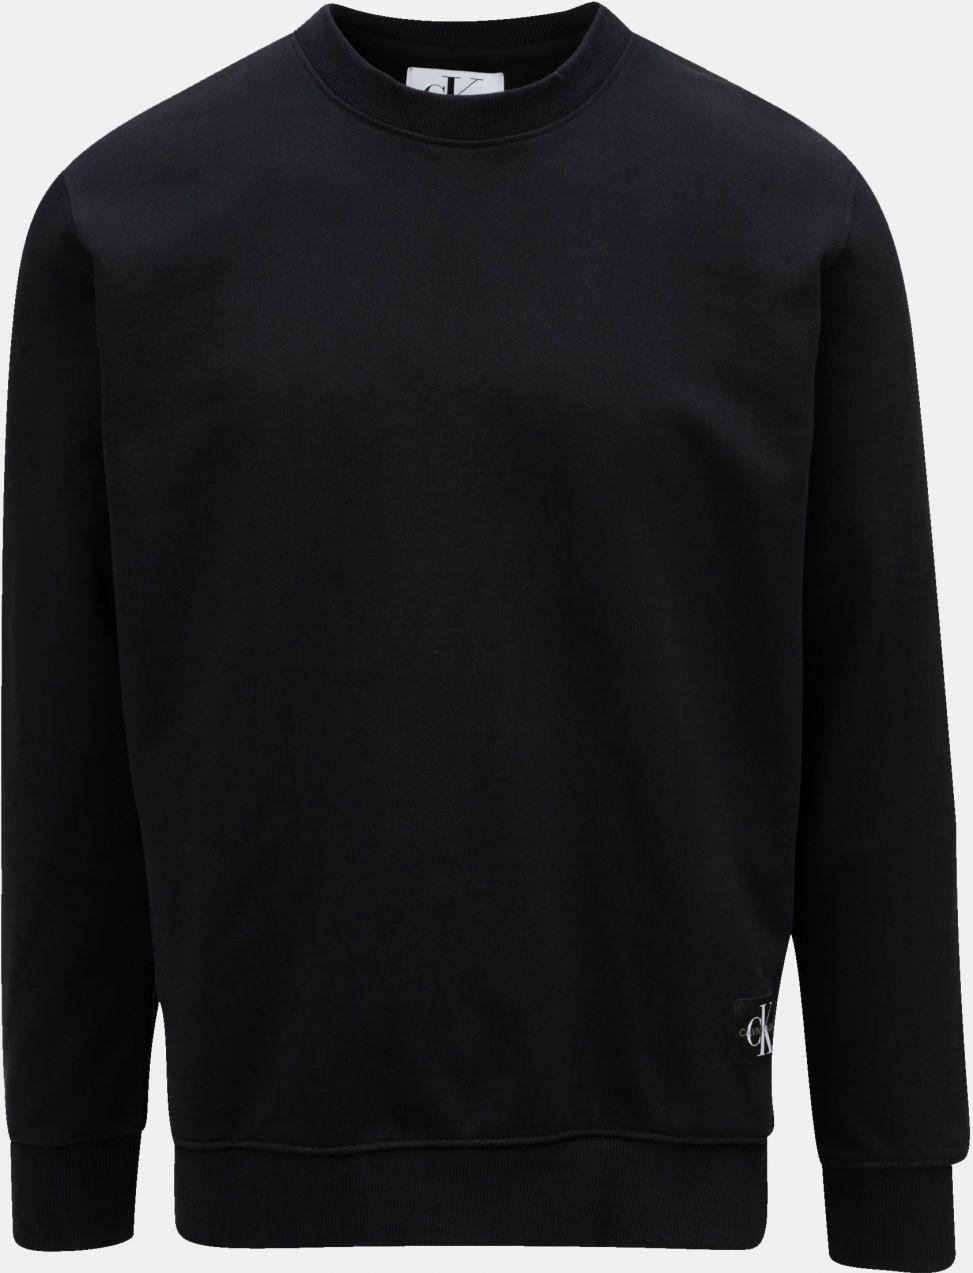 16f3995498 Čierna pánska mikina Calvin Klein Jeans značky Calvin Klein Jeans -  Lovely.sk